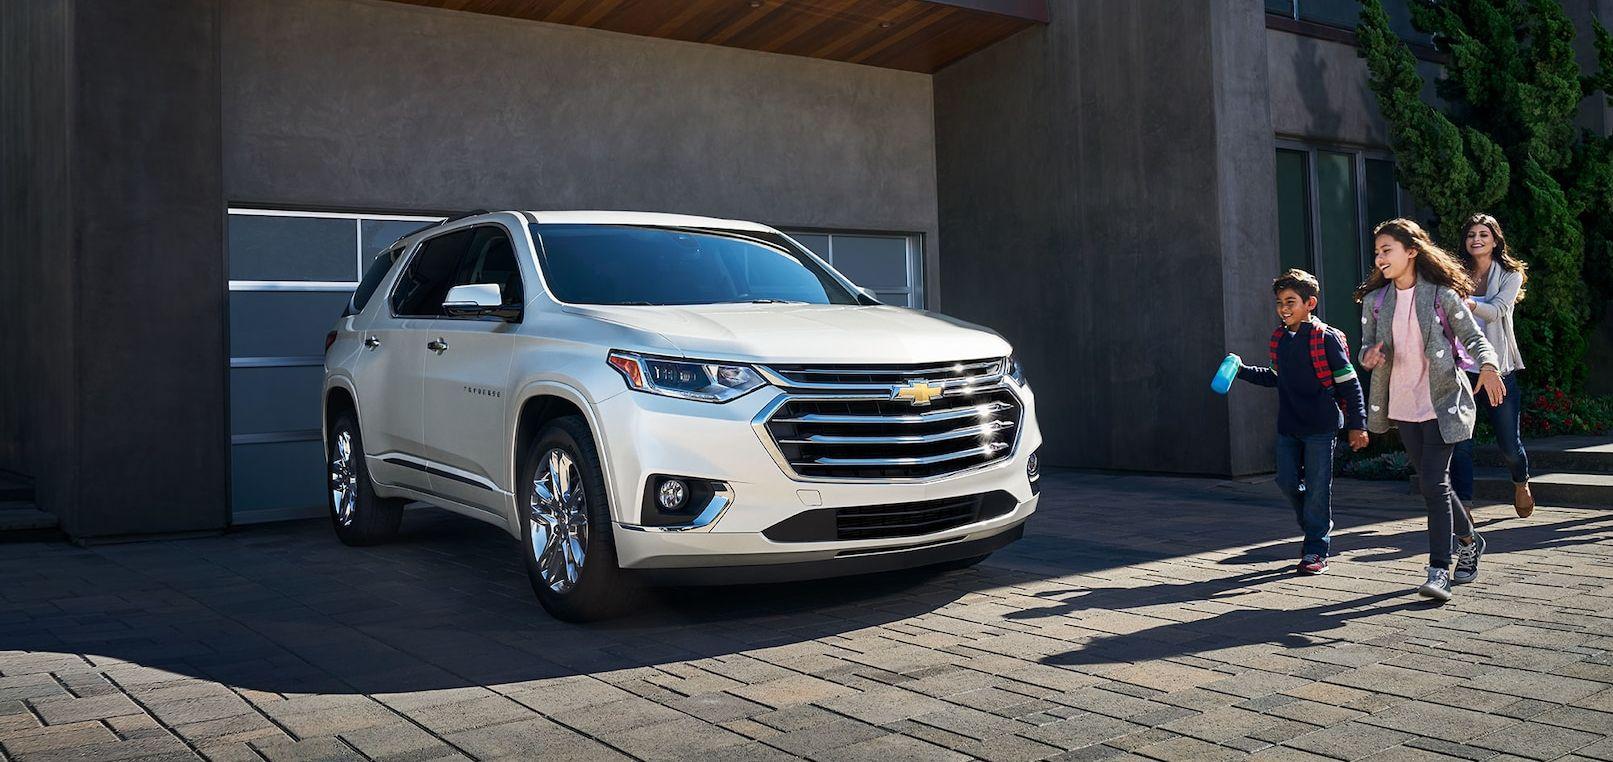 2019 Chevrolet Traverse for Sale near Manitou Beach, SK